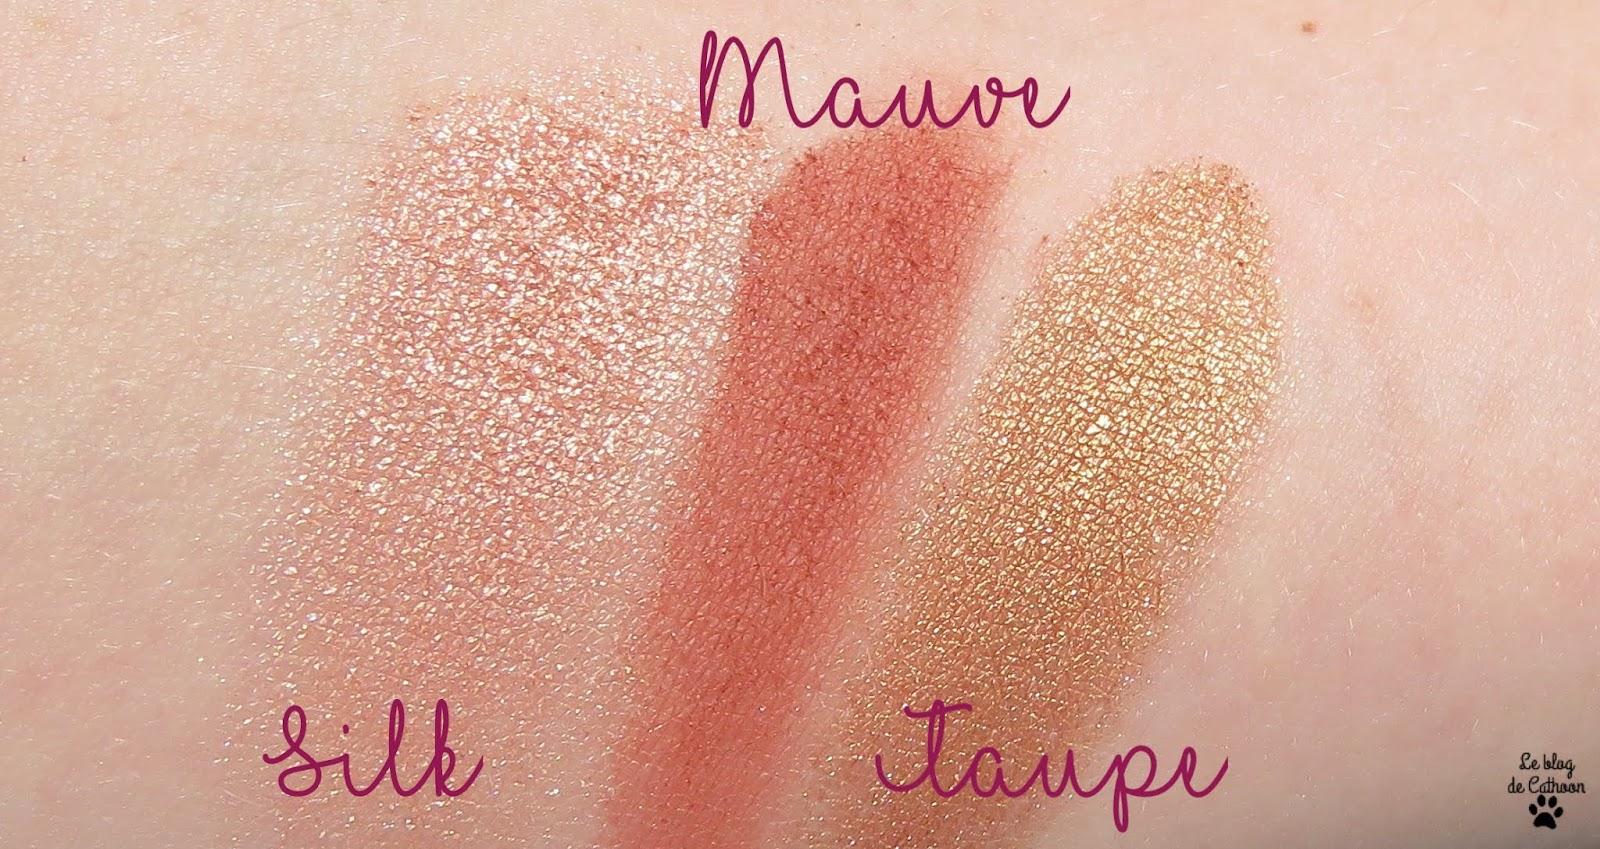 Ps... Peach Dream Palette - Makeup Primark -